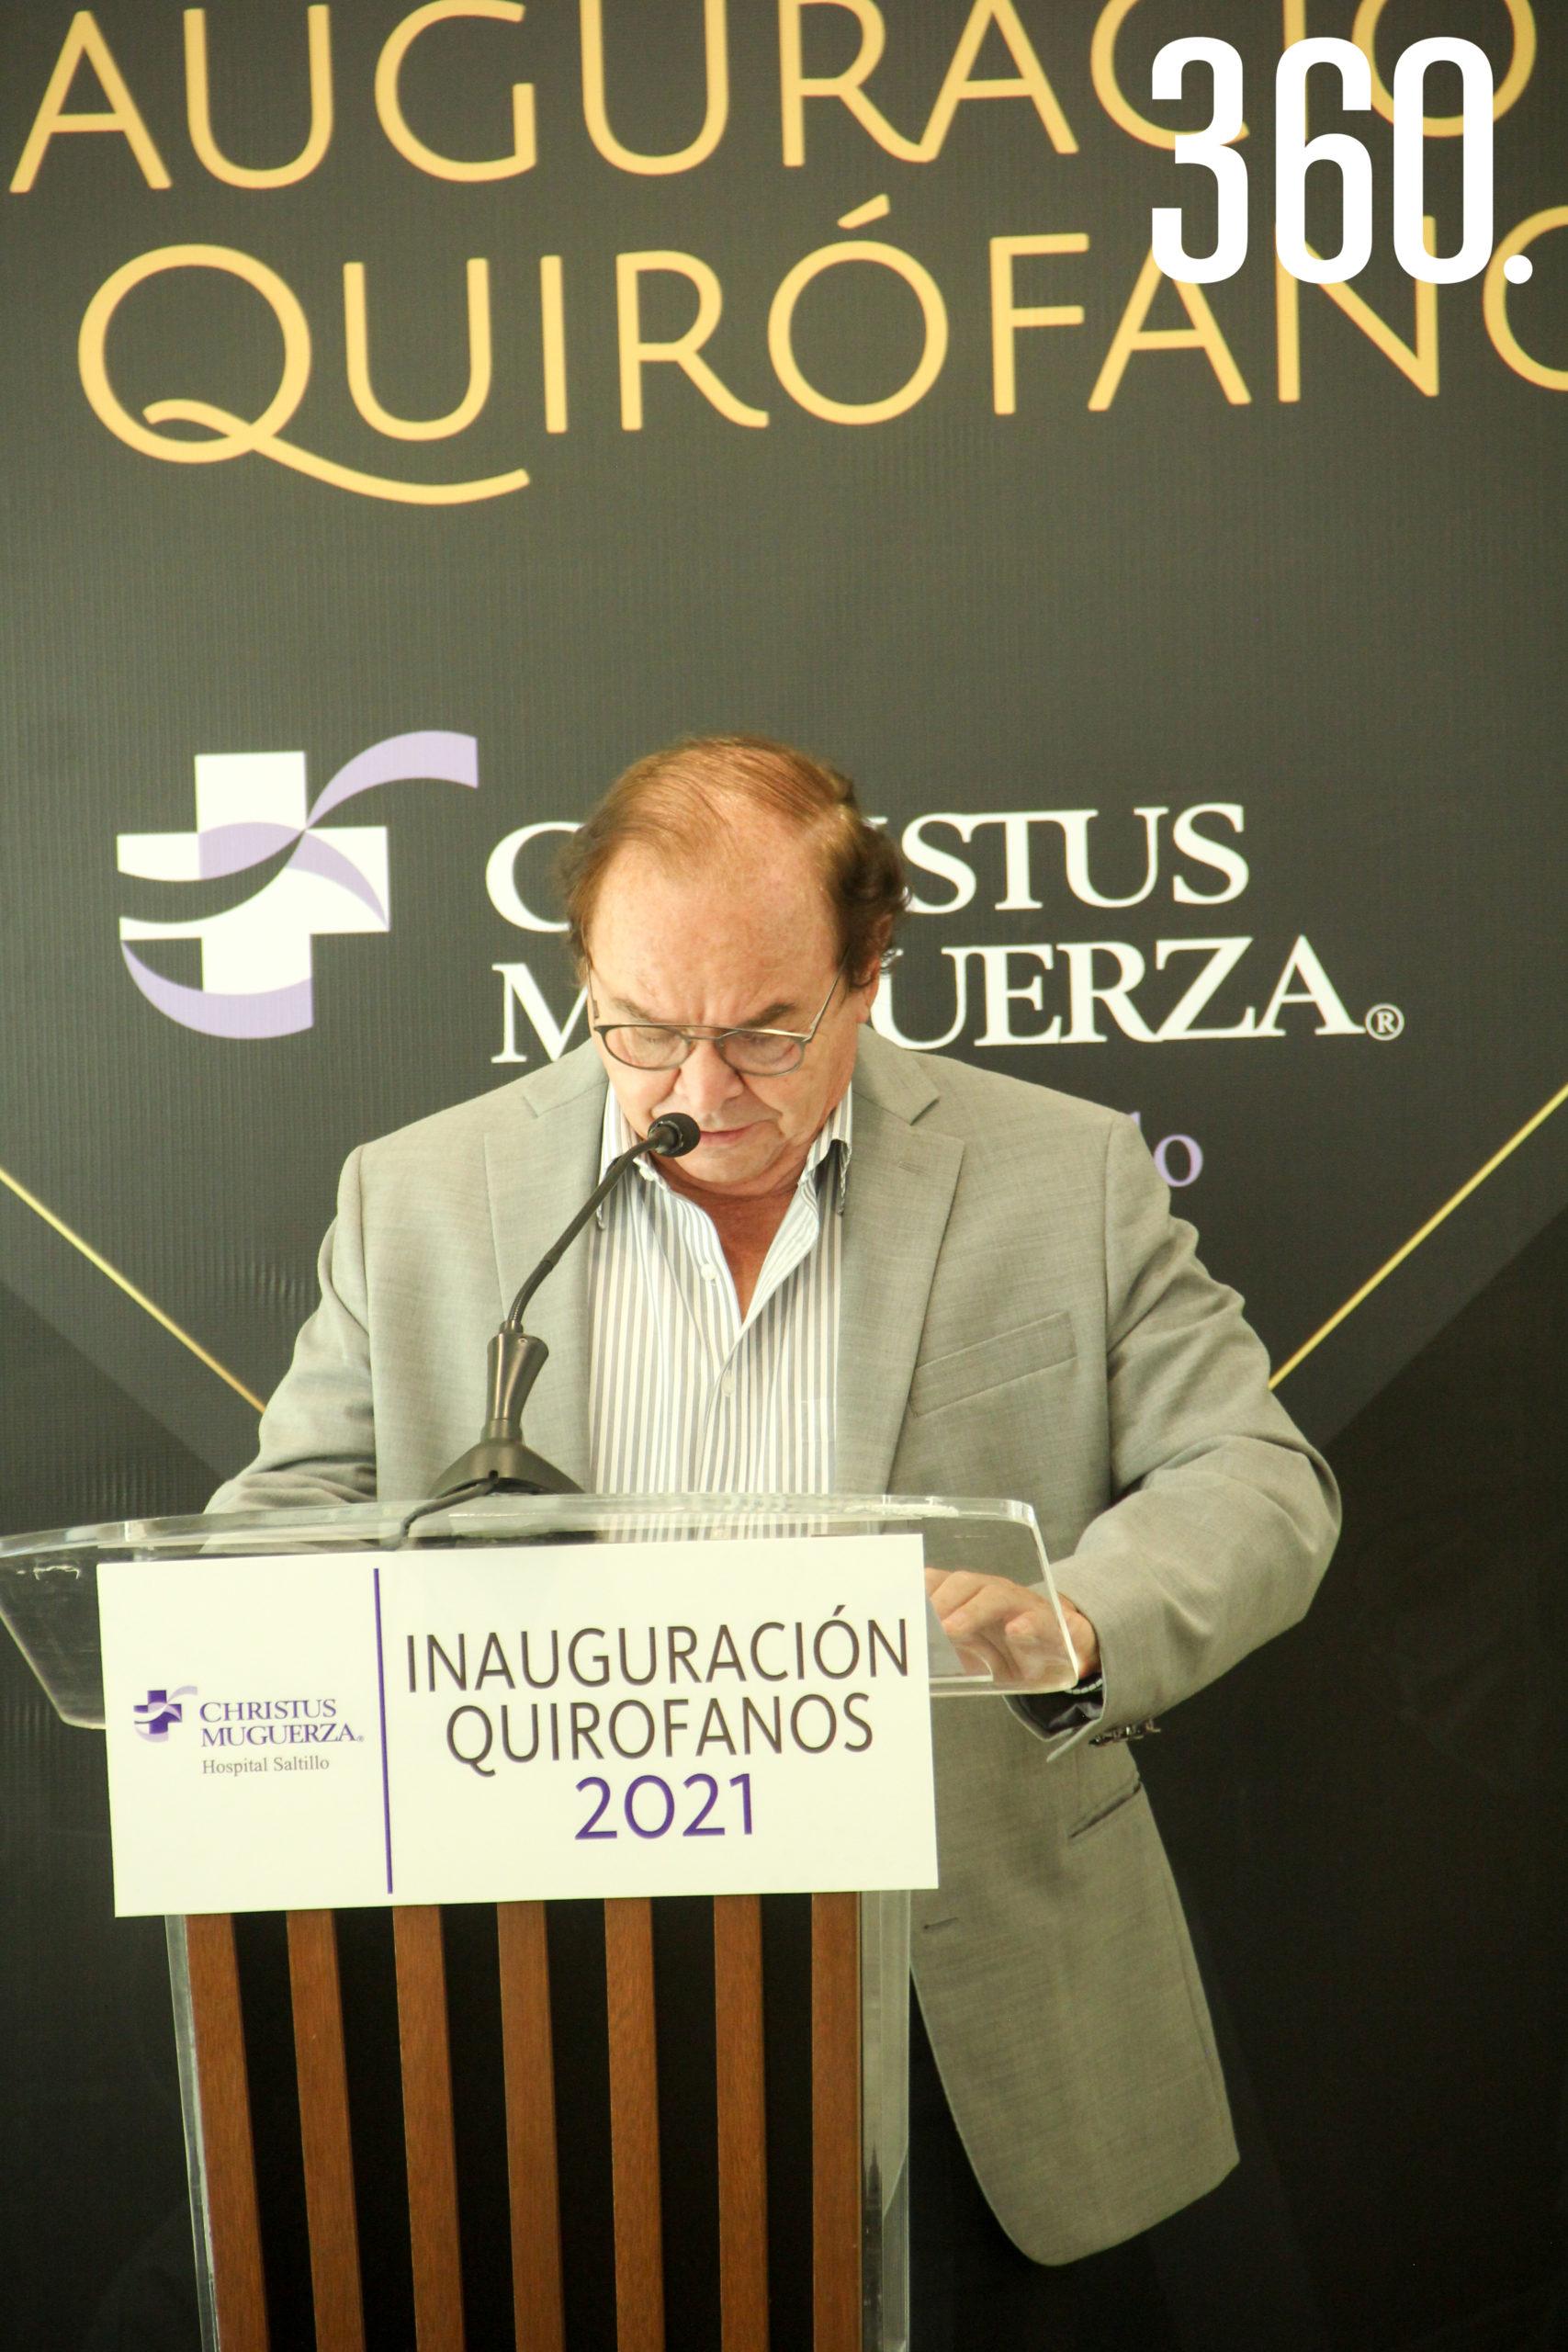 Dr. Eliud Felipe Aguirre.